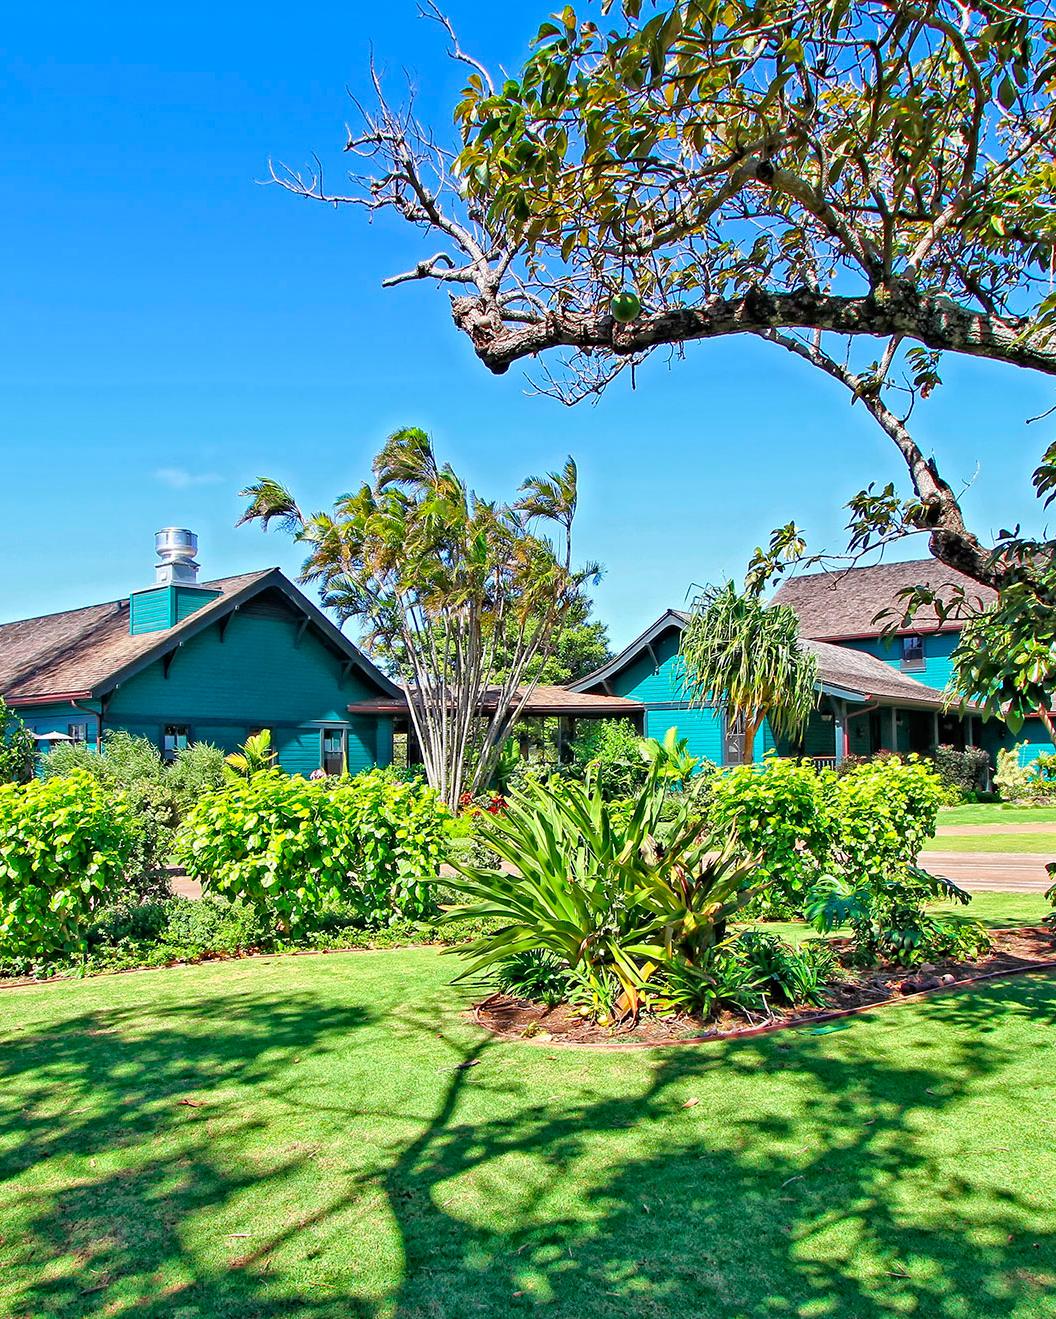 hawaii-hotels-lumeria-maui-0415.jpg